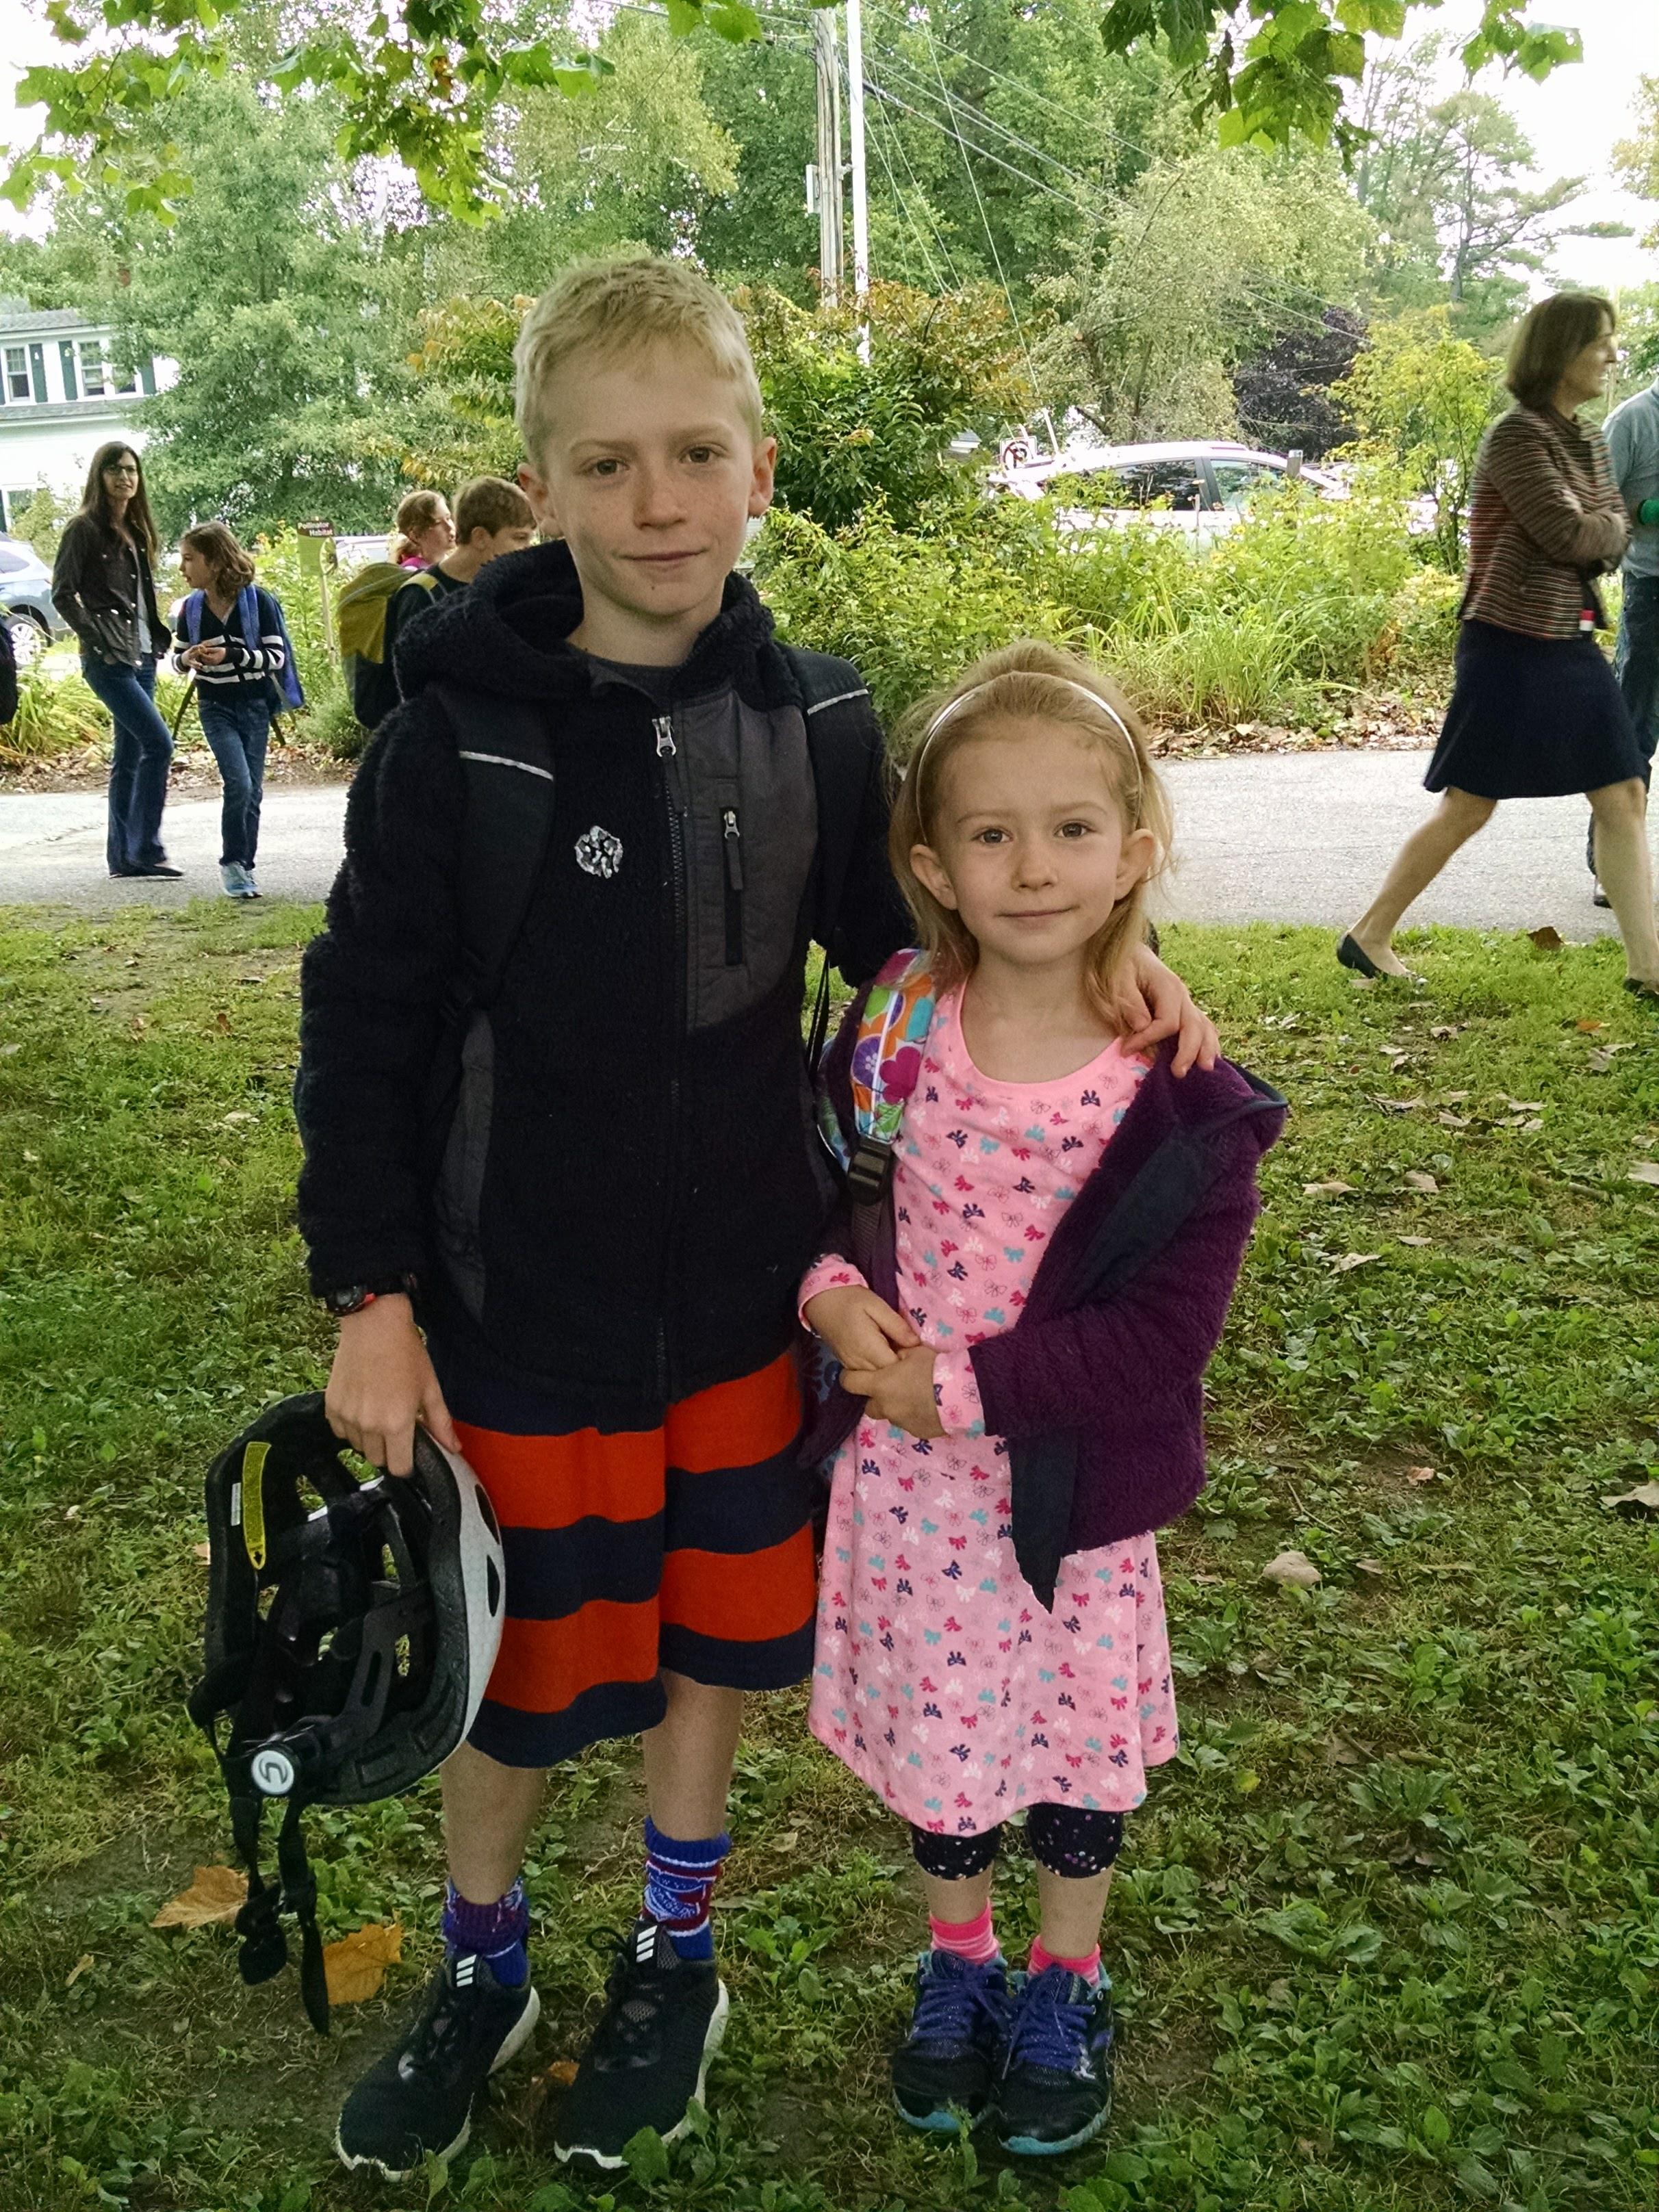 Gavin & Keira's 1st Day of School 2017